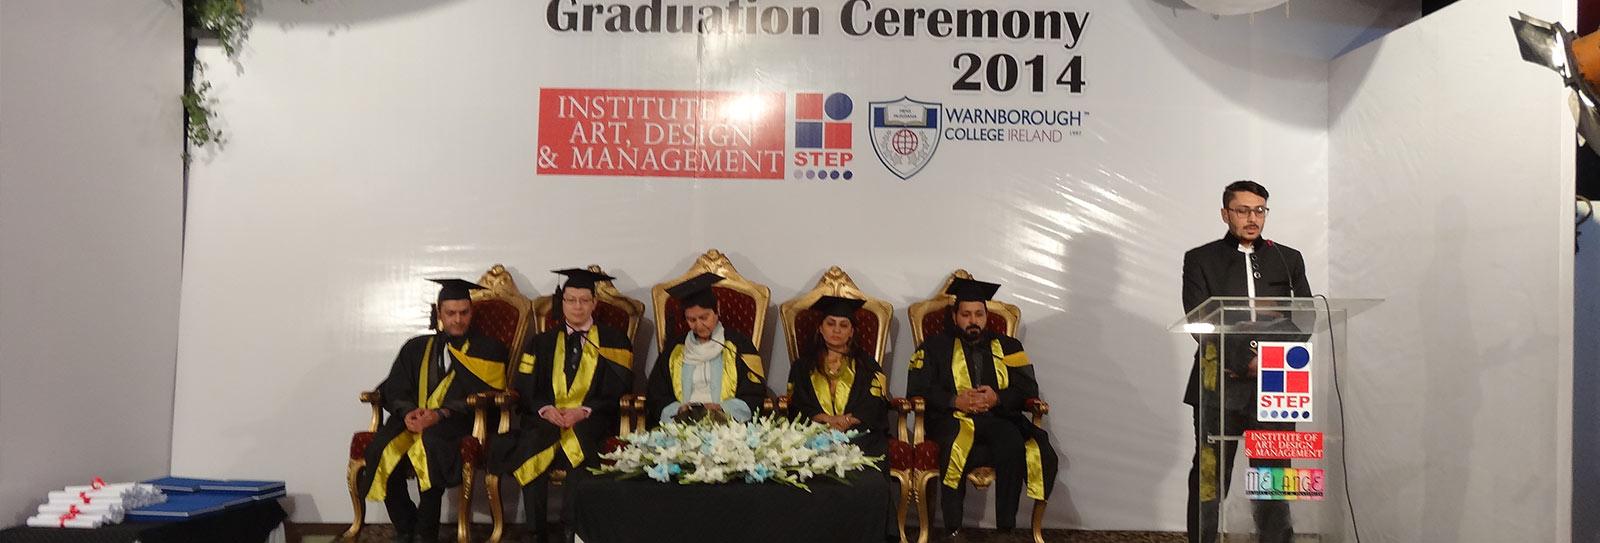 Iadm Graduation In Pakistan Warnborough Worldwide